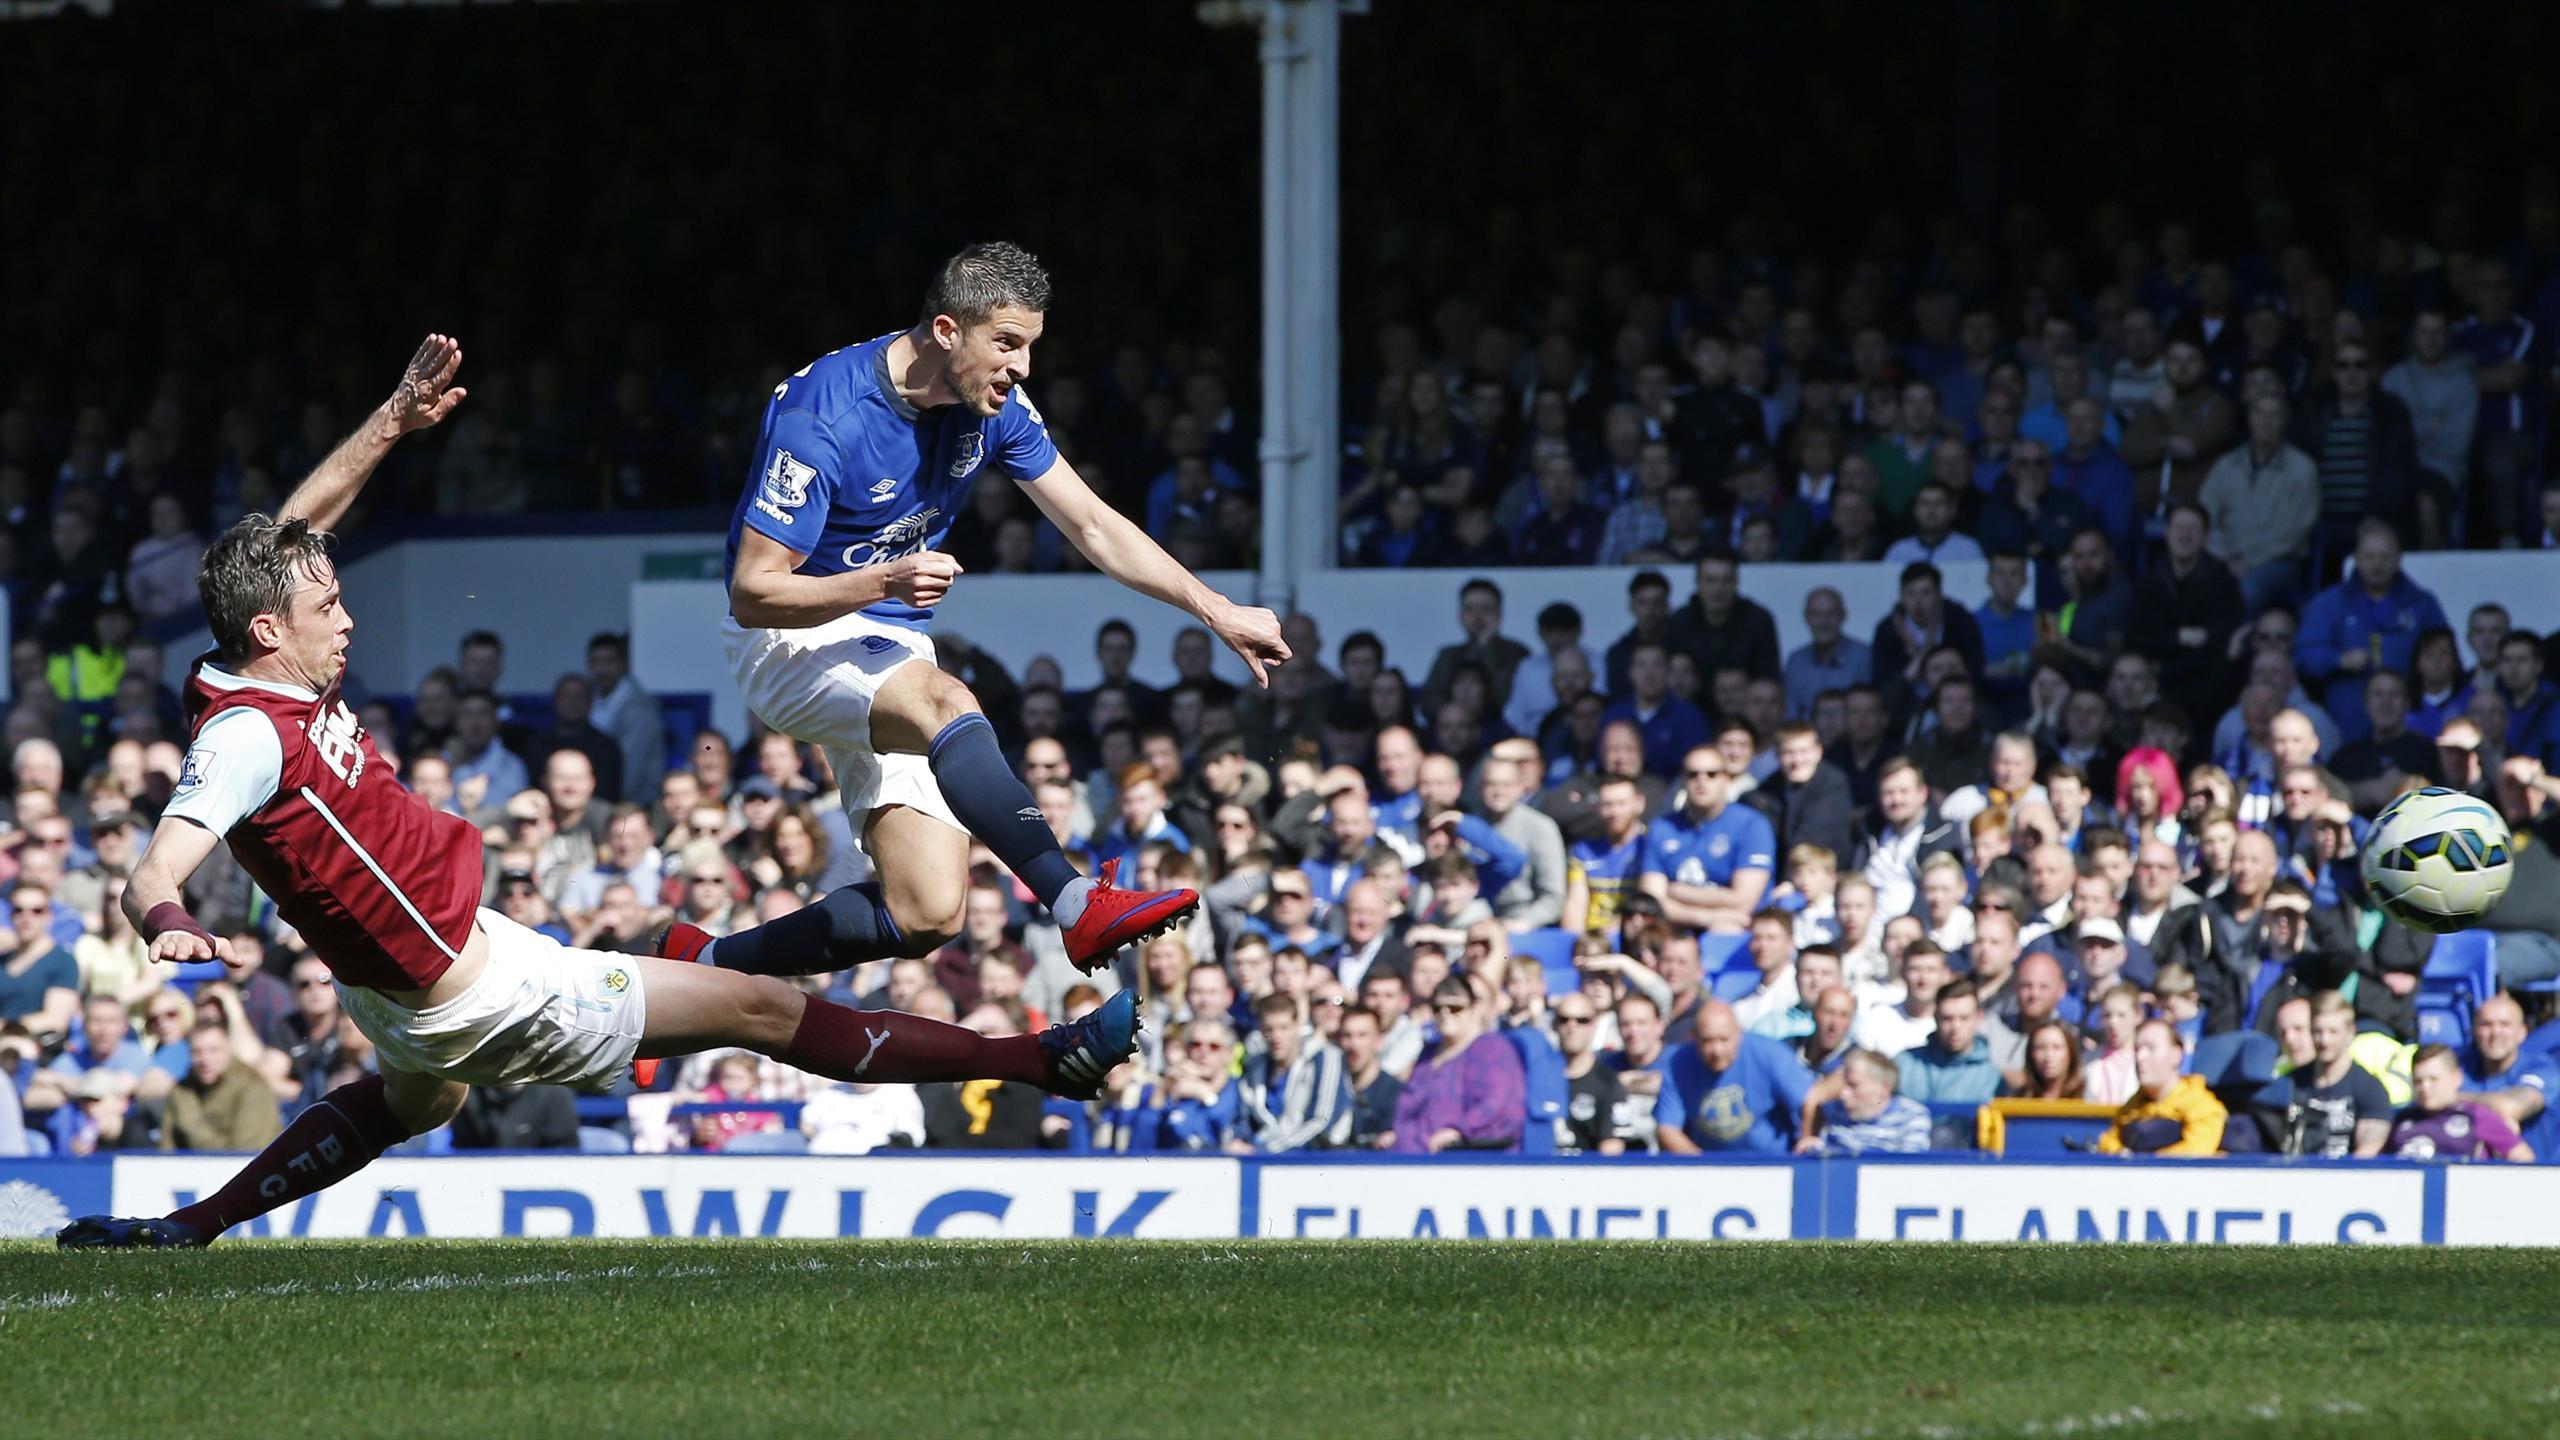 Video: Everton vs Burnley